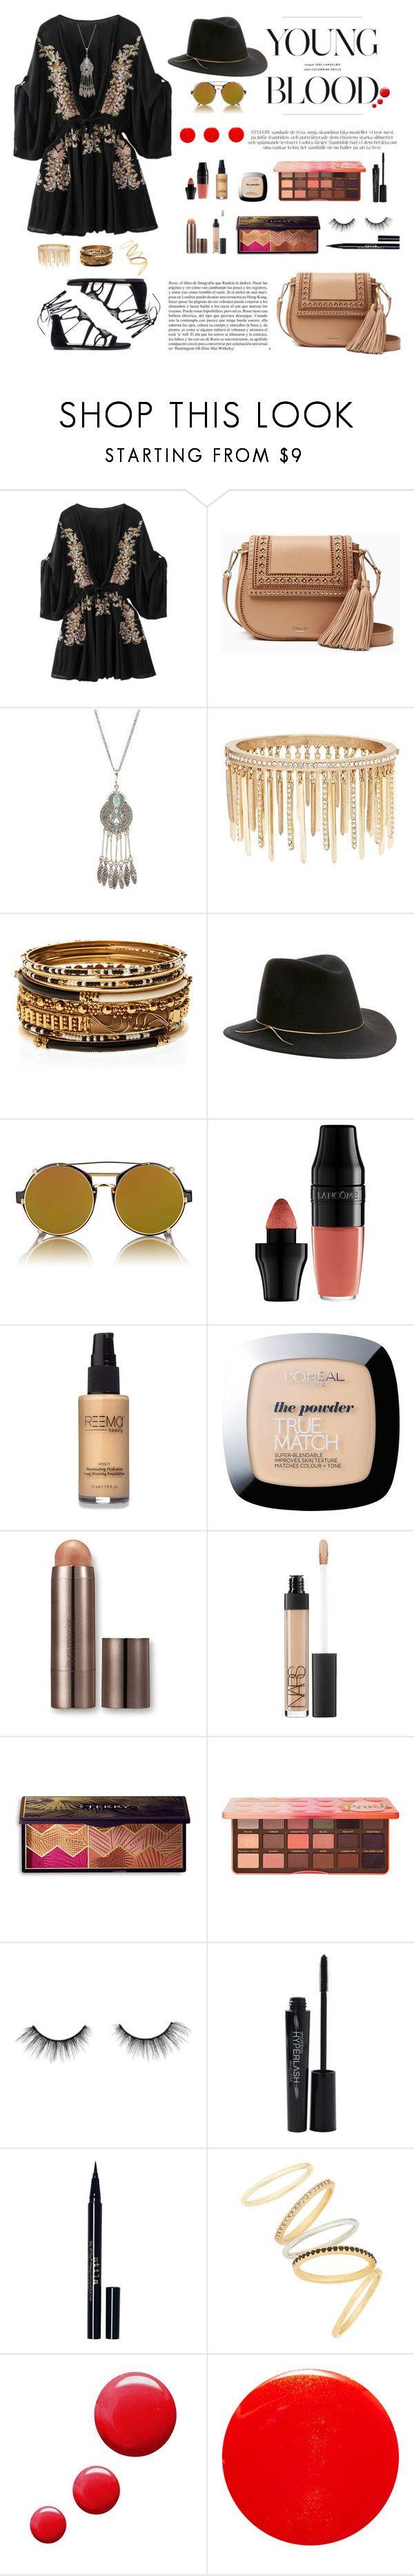 """Coachella #1"" by taniawaspodo ❤ liked on Polyvore featuring Kate Spade, Jenny Packham, Amrita Singh, Eugenia Kim, Finlay & Co., Whiteley, Lancôme, L'Oréal Paris, Laura Mercier and NARS Cosmetics"